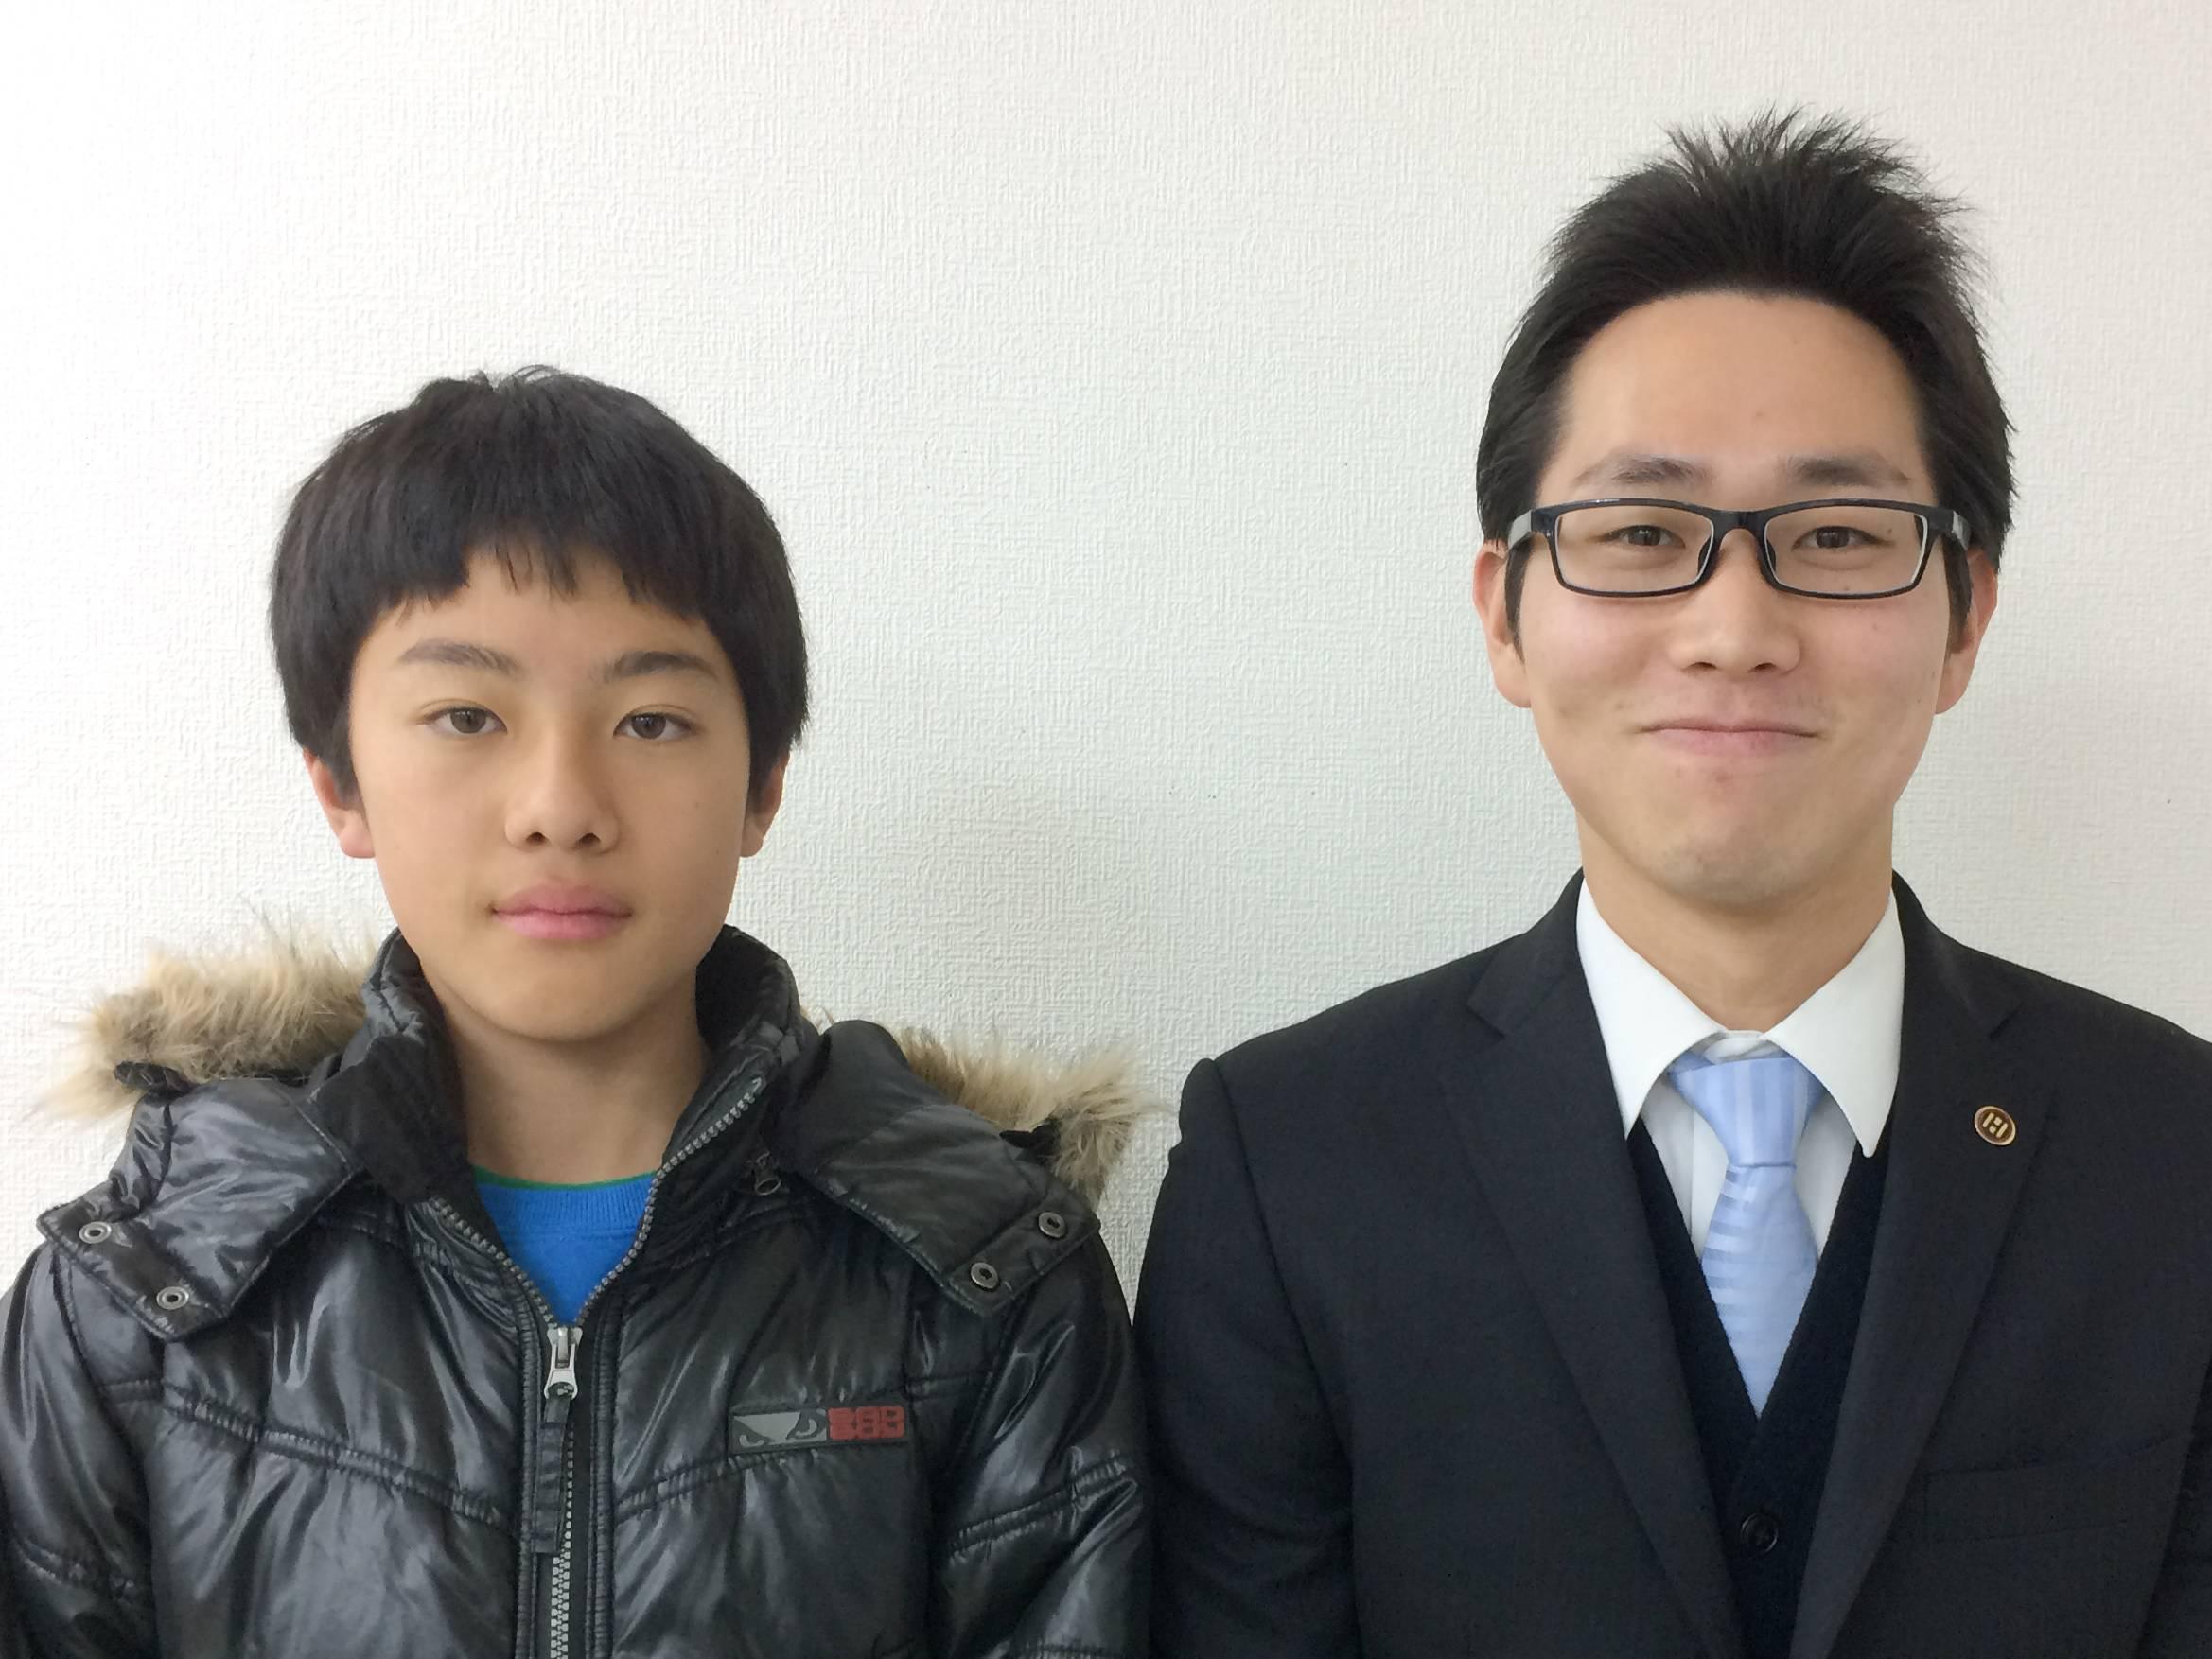 H29春 中学1年 青木優斗くん 杉本先生